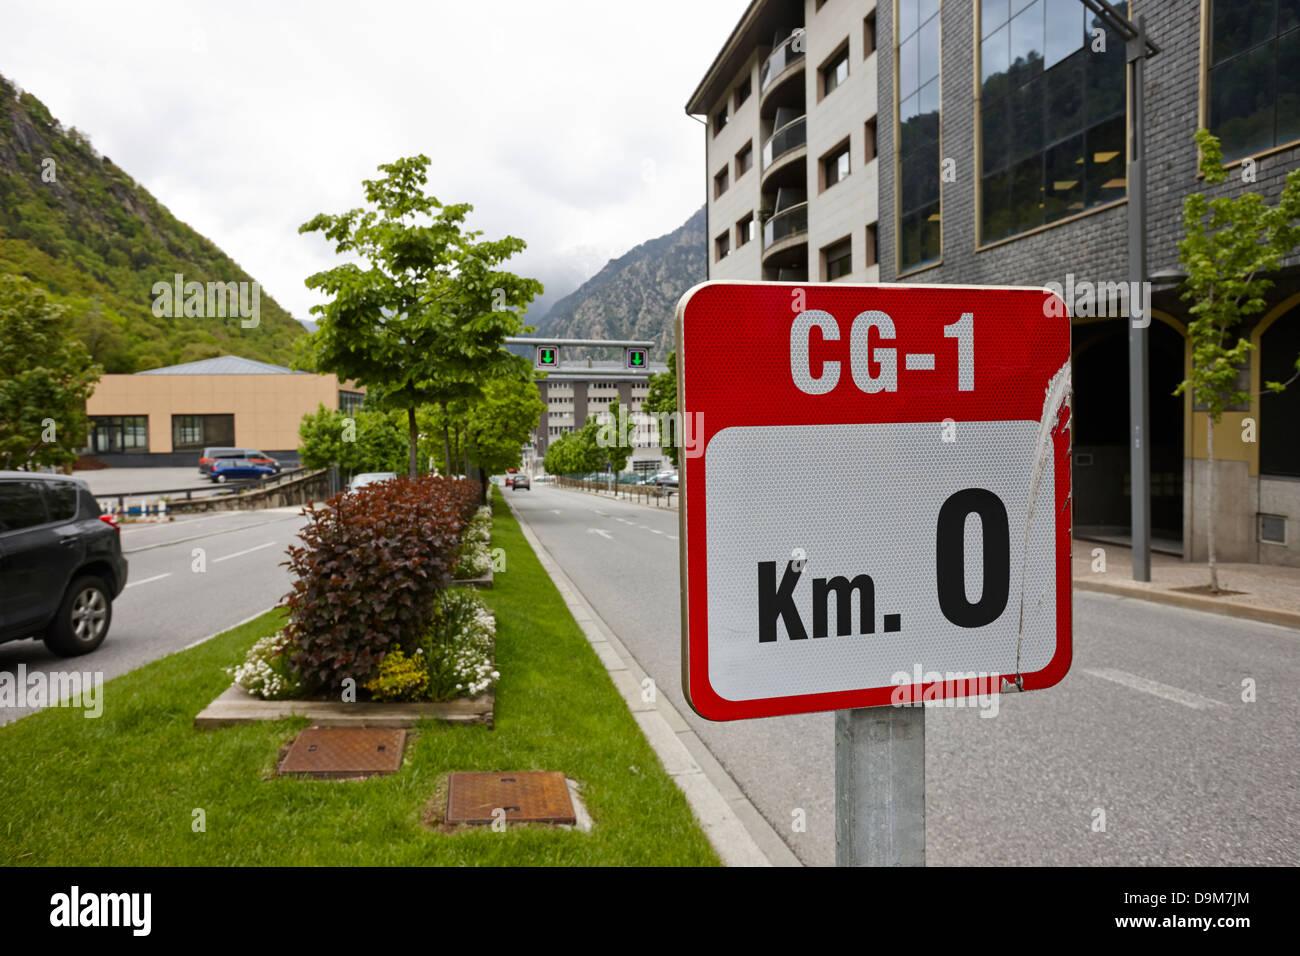 cg-1 signpost at km 0 start of the main roads andorra la vella andorra - Stock Image